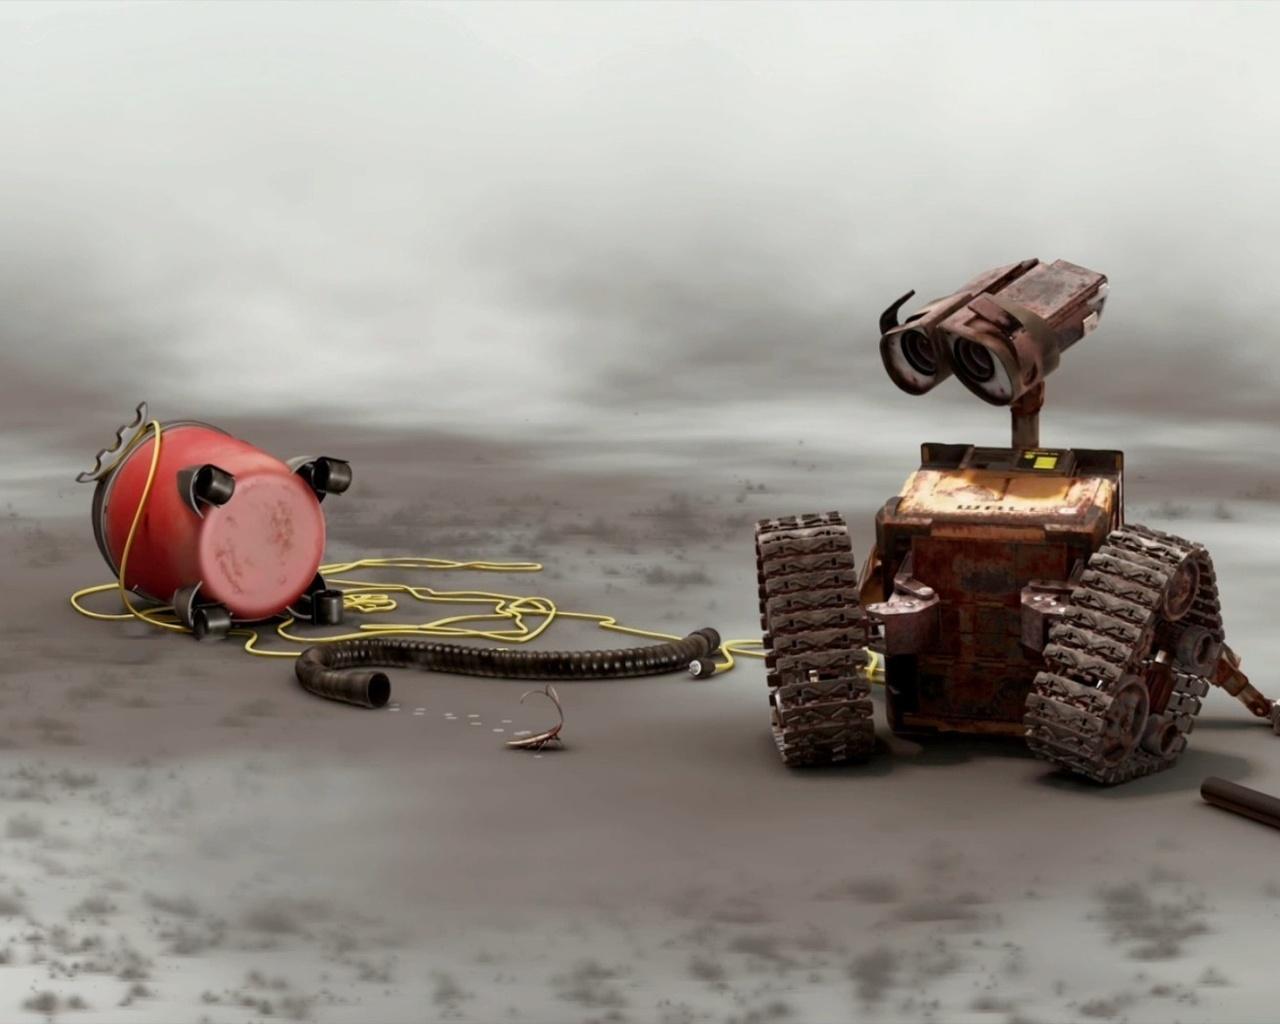 wall-e, vacuum, relax, механика